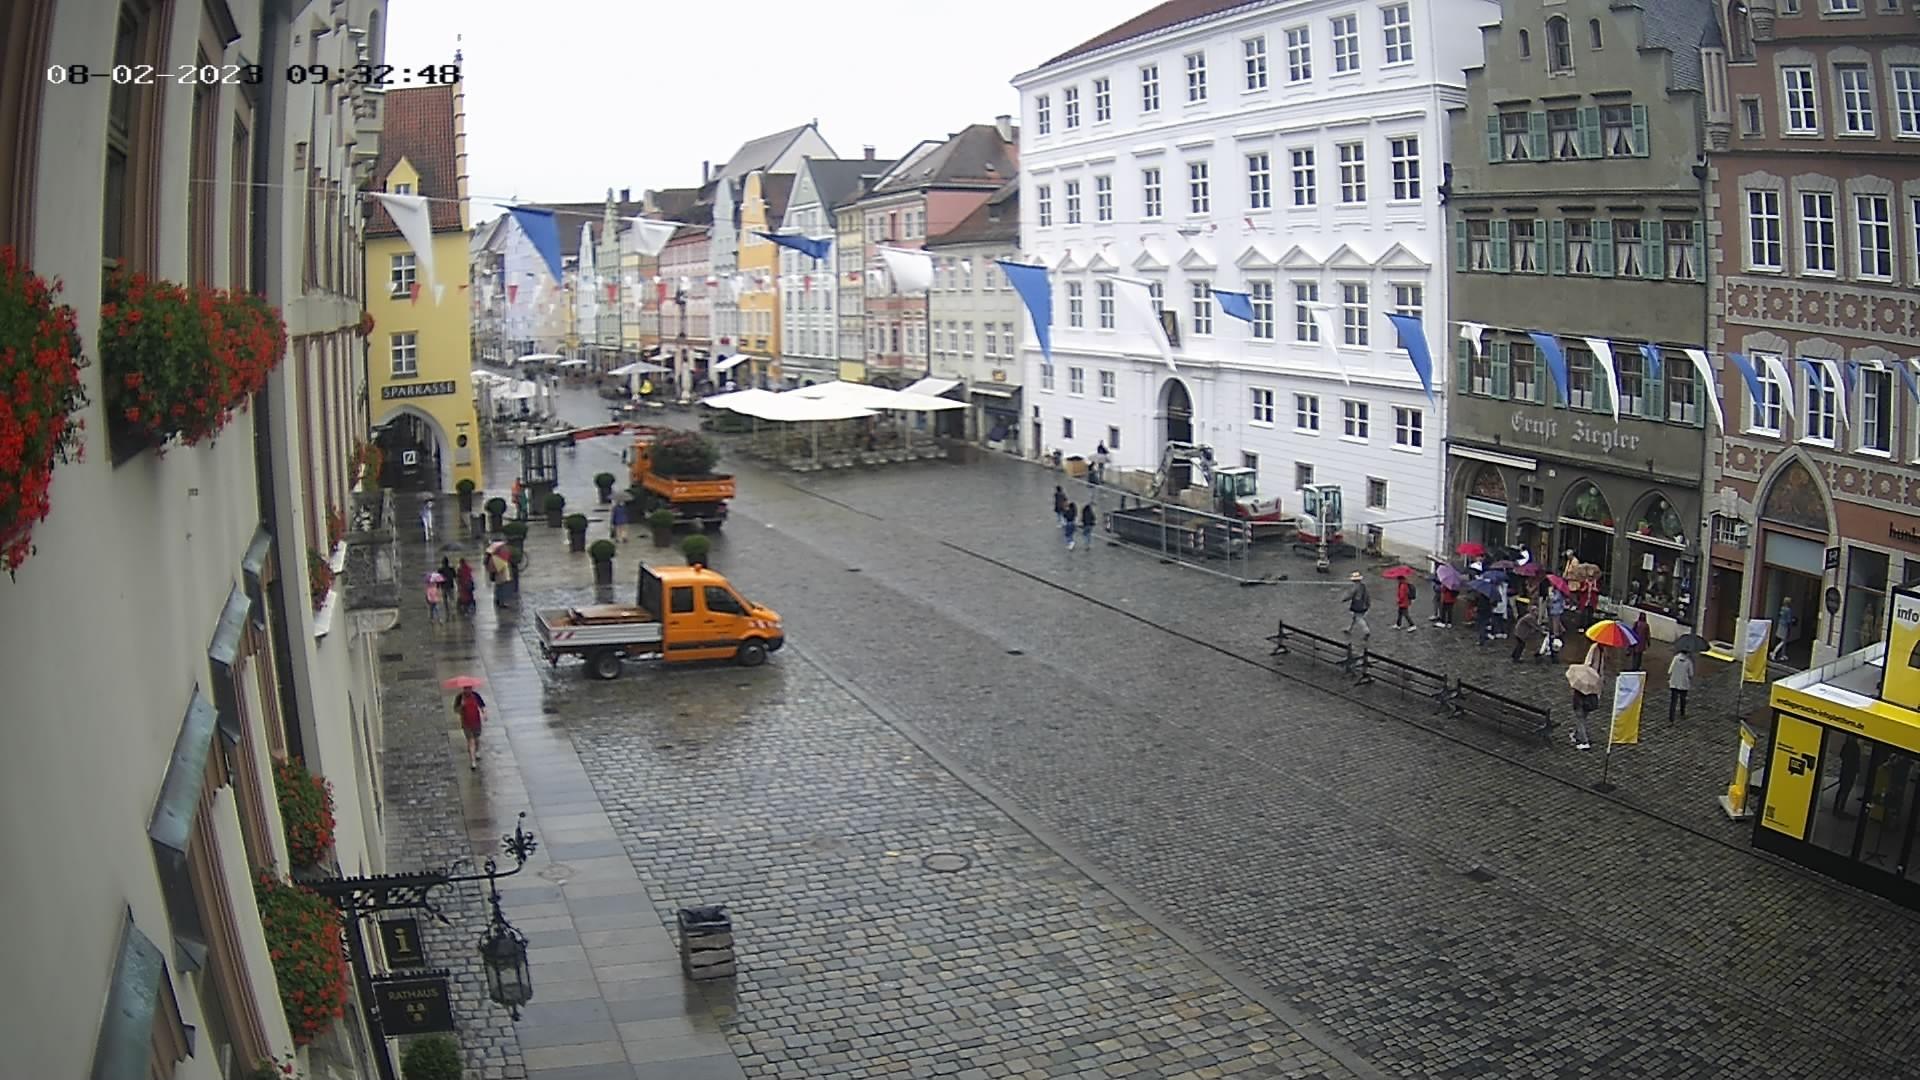 Landshut Webcam